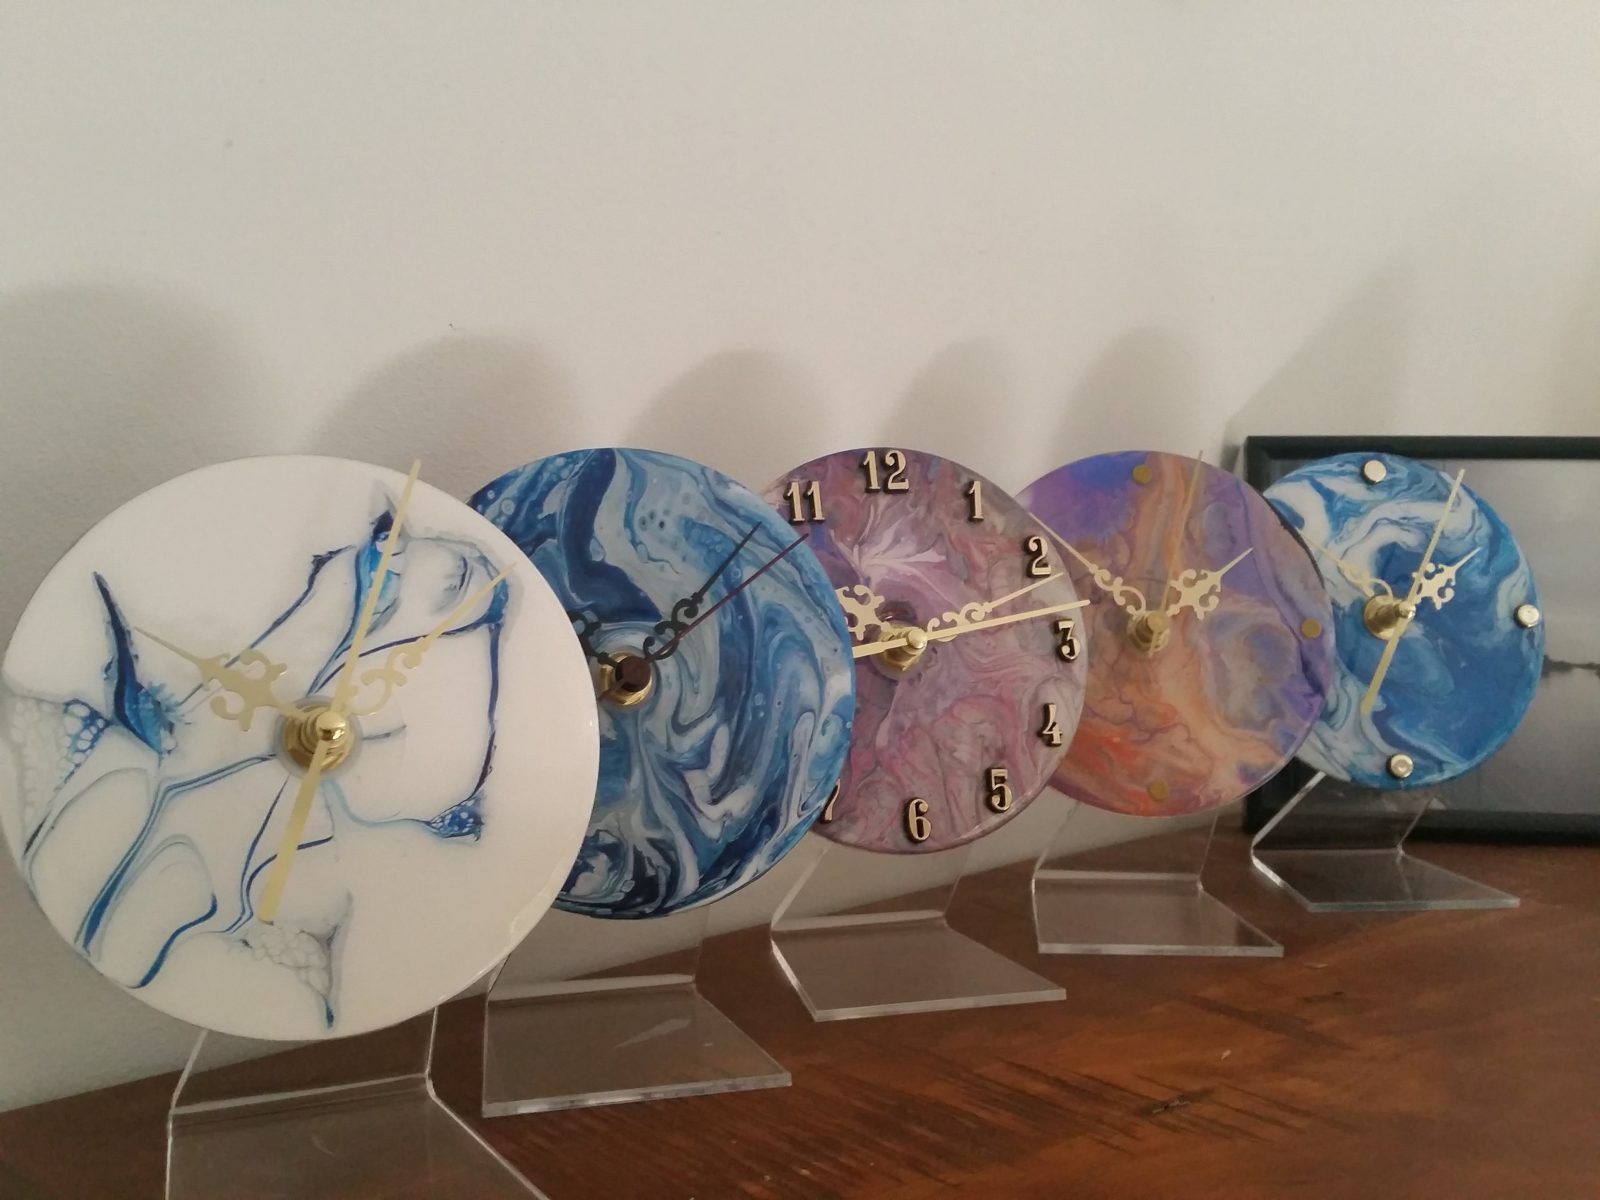 Acrylic clocks